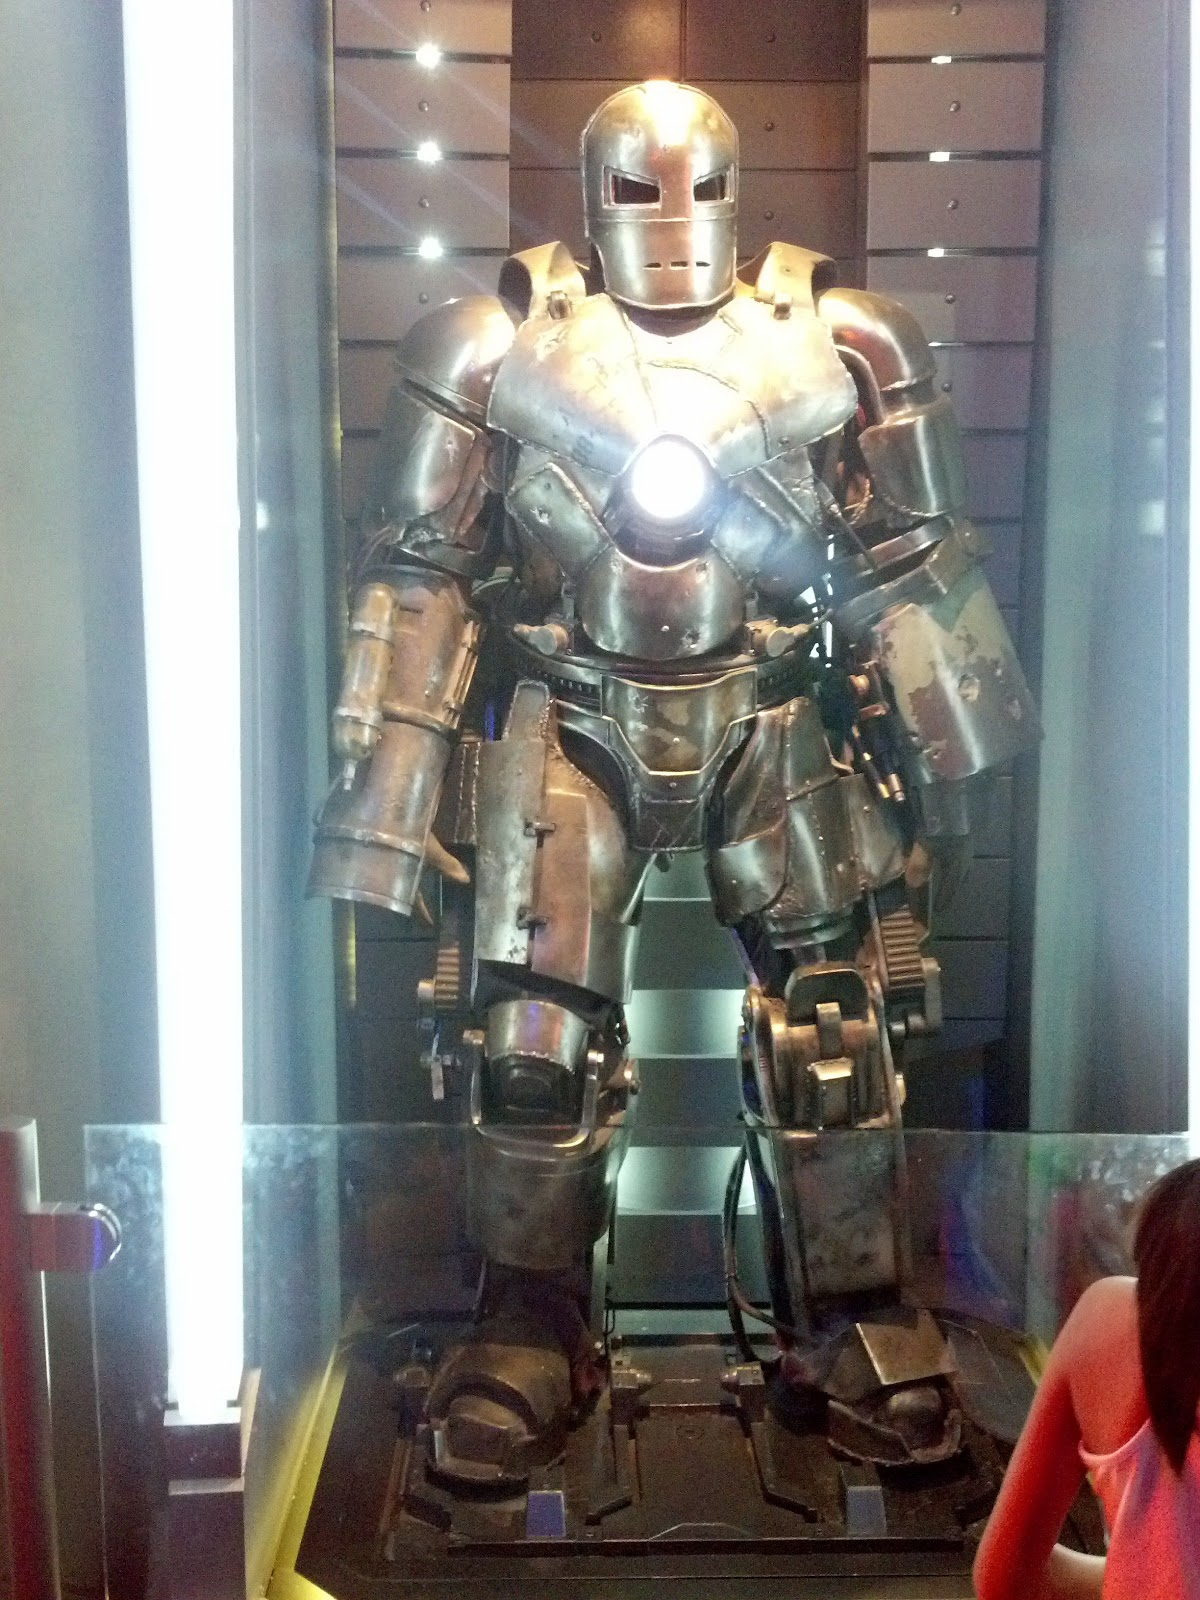 Iron Man Suits Mark 41 | www.imgkid.com - The Image Kid ...